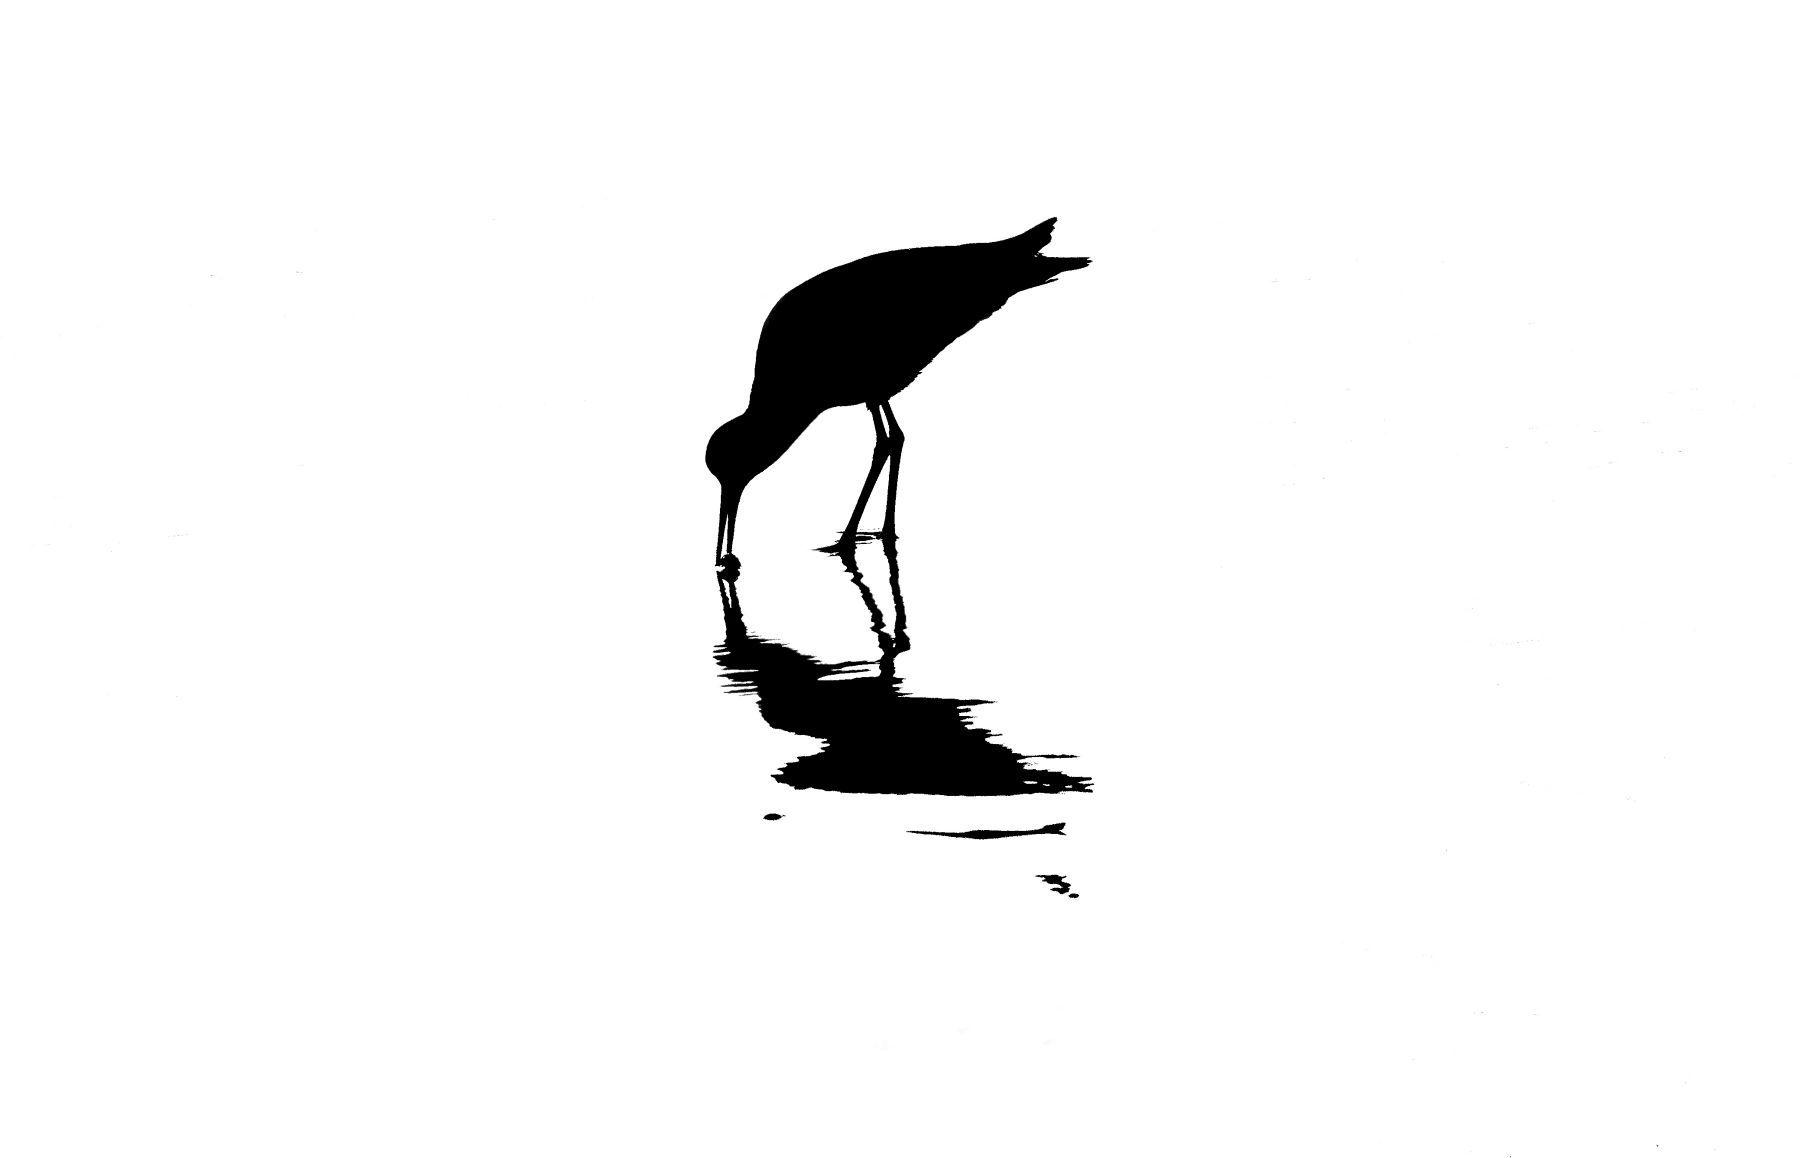 Bird Series #10 - Stillness ©2015 L. Aviva Diamond